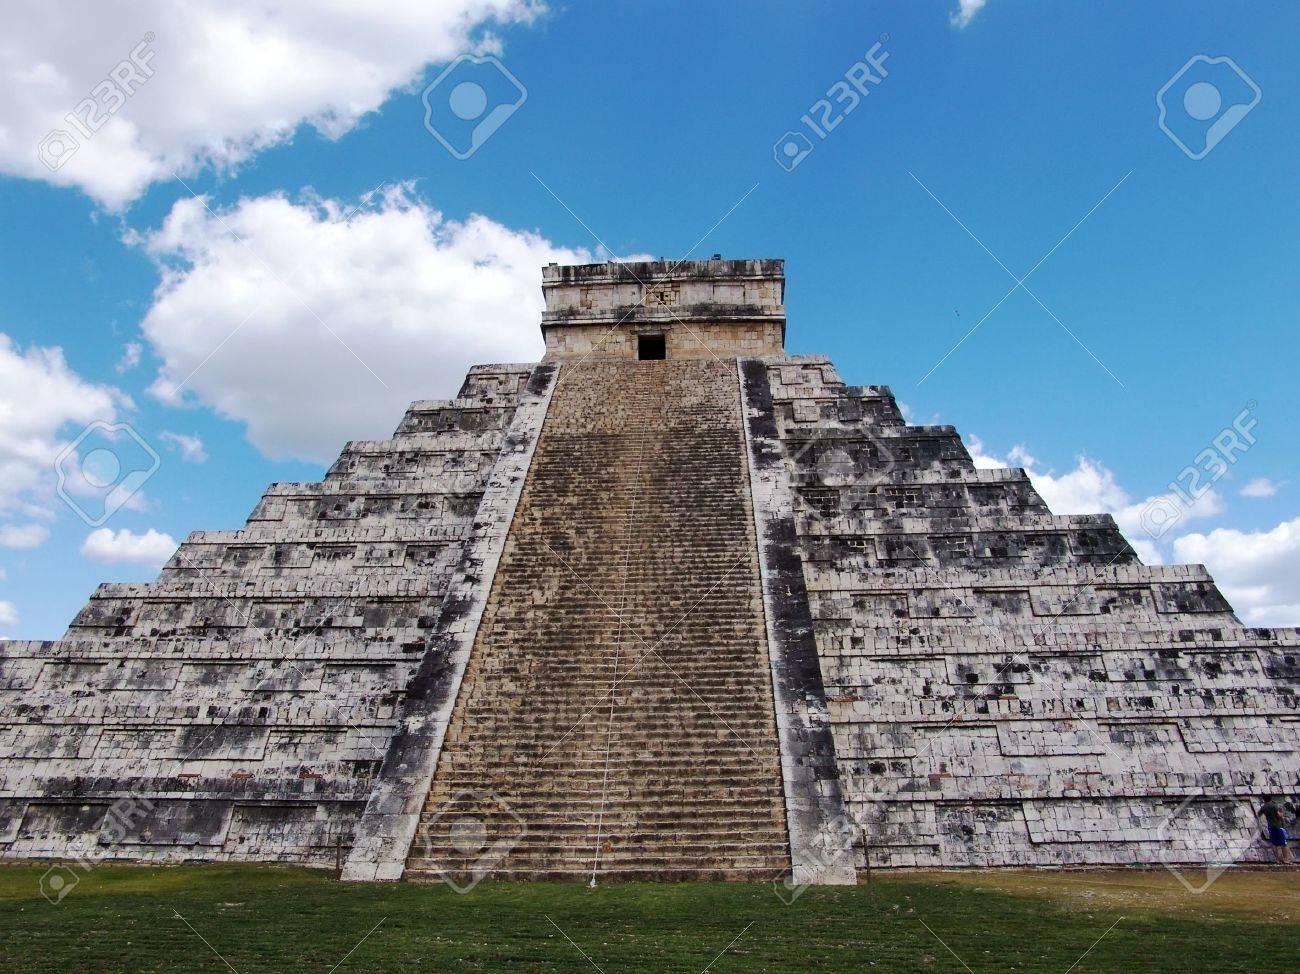 Pyramid of Kukulkan at Chichen Itza. Mayan culture, Chichen Itza, Yucatan Peninsula, Mexico. Travel Destination. Stock Photo - 5426252